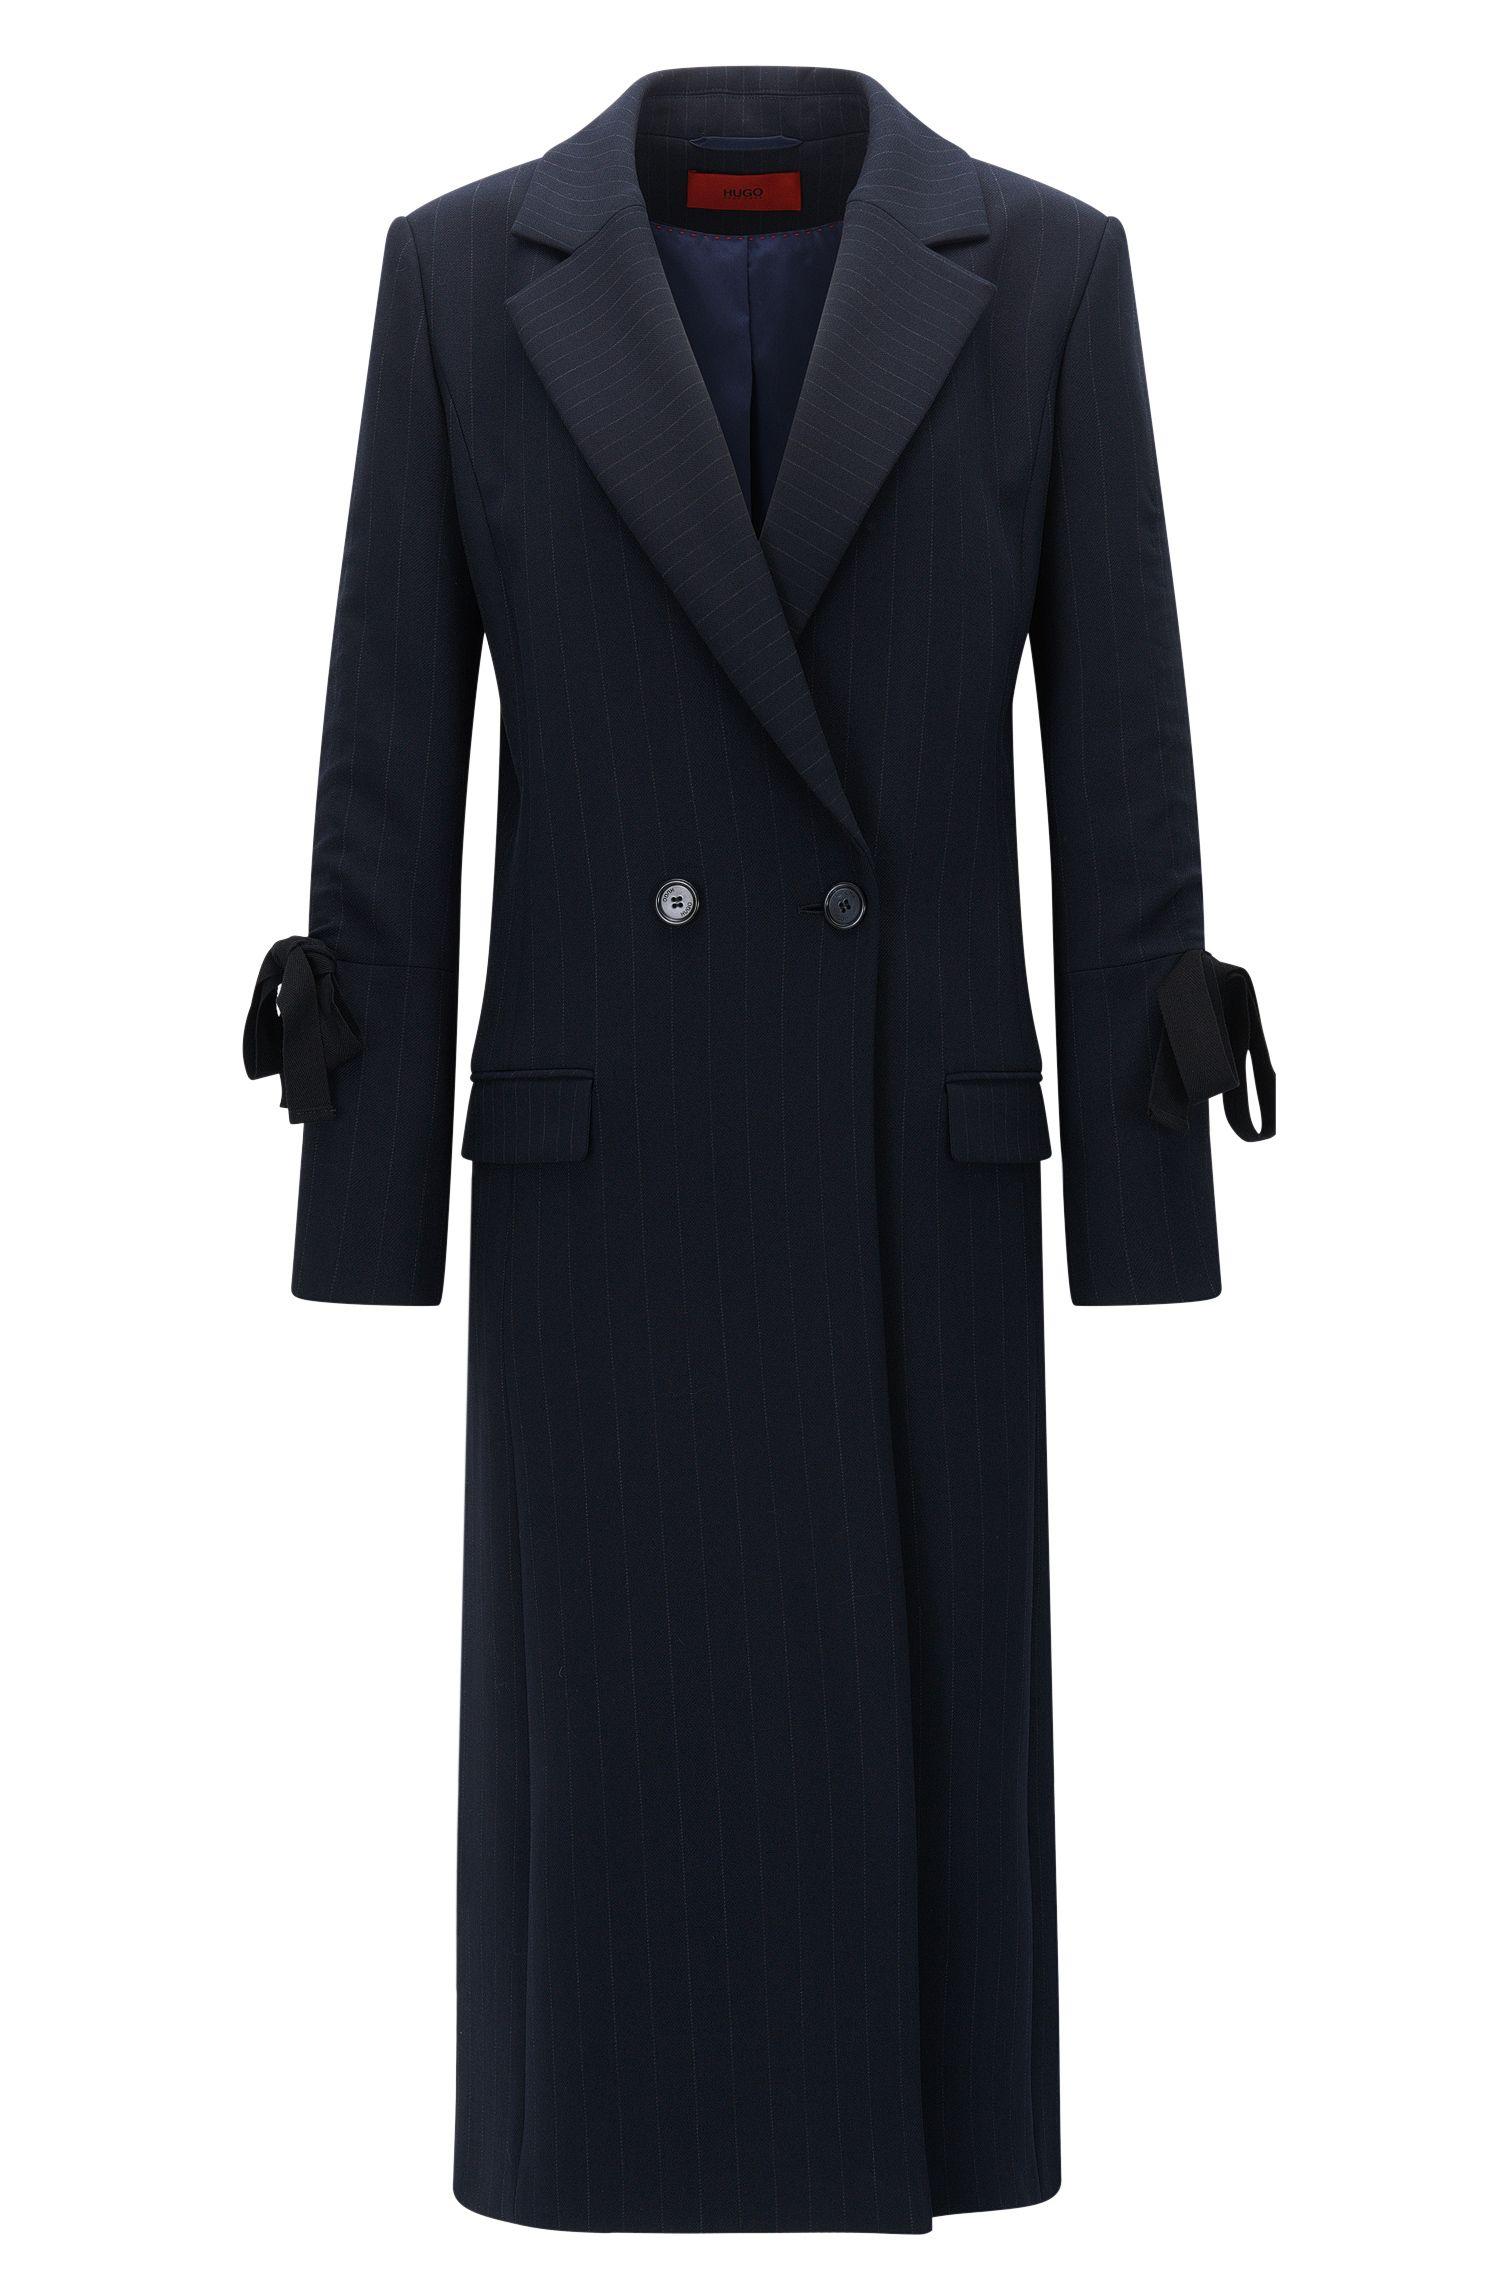 Abrigo con raya diplomática y tejido de doble cara